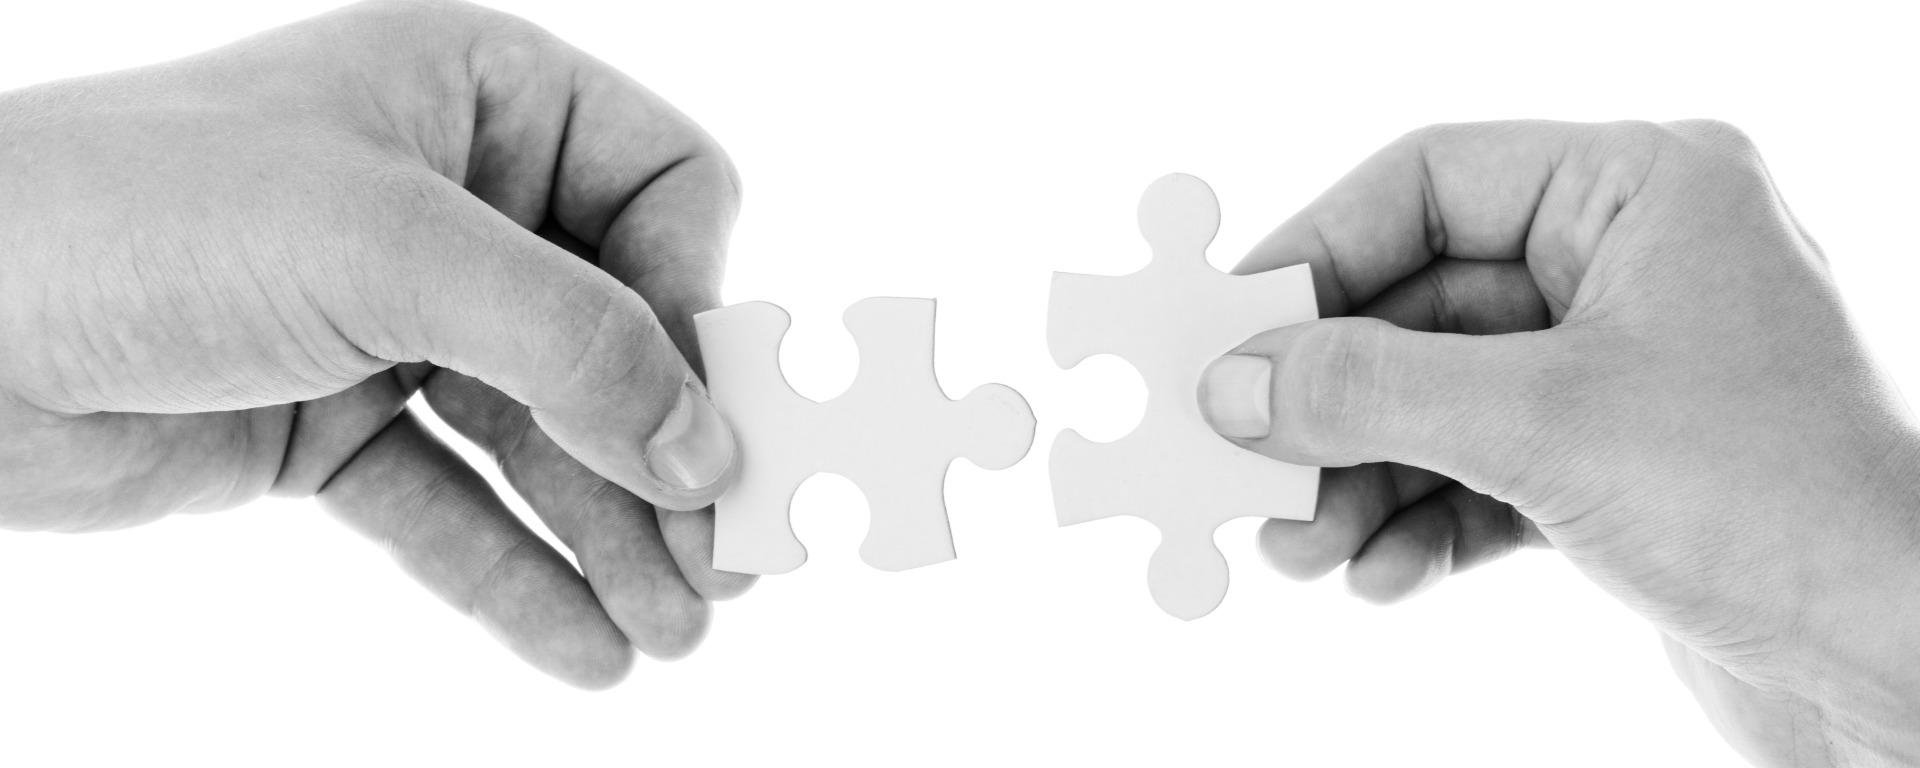 Communication, public relations, network , PR professionals, marketing, effective communication, media relations